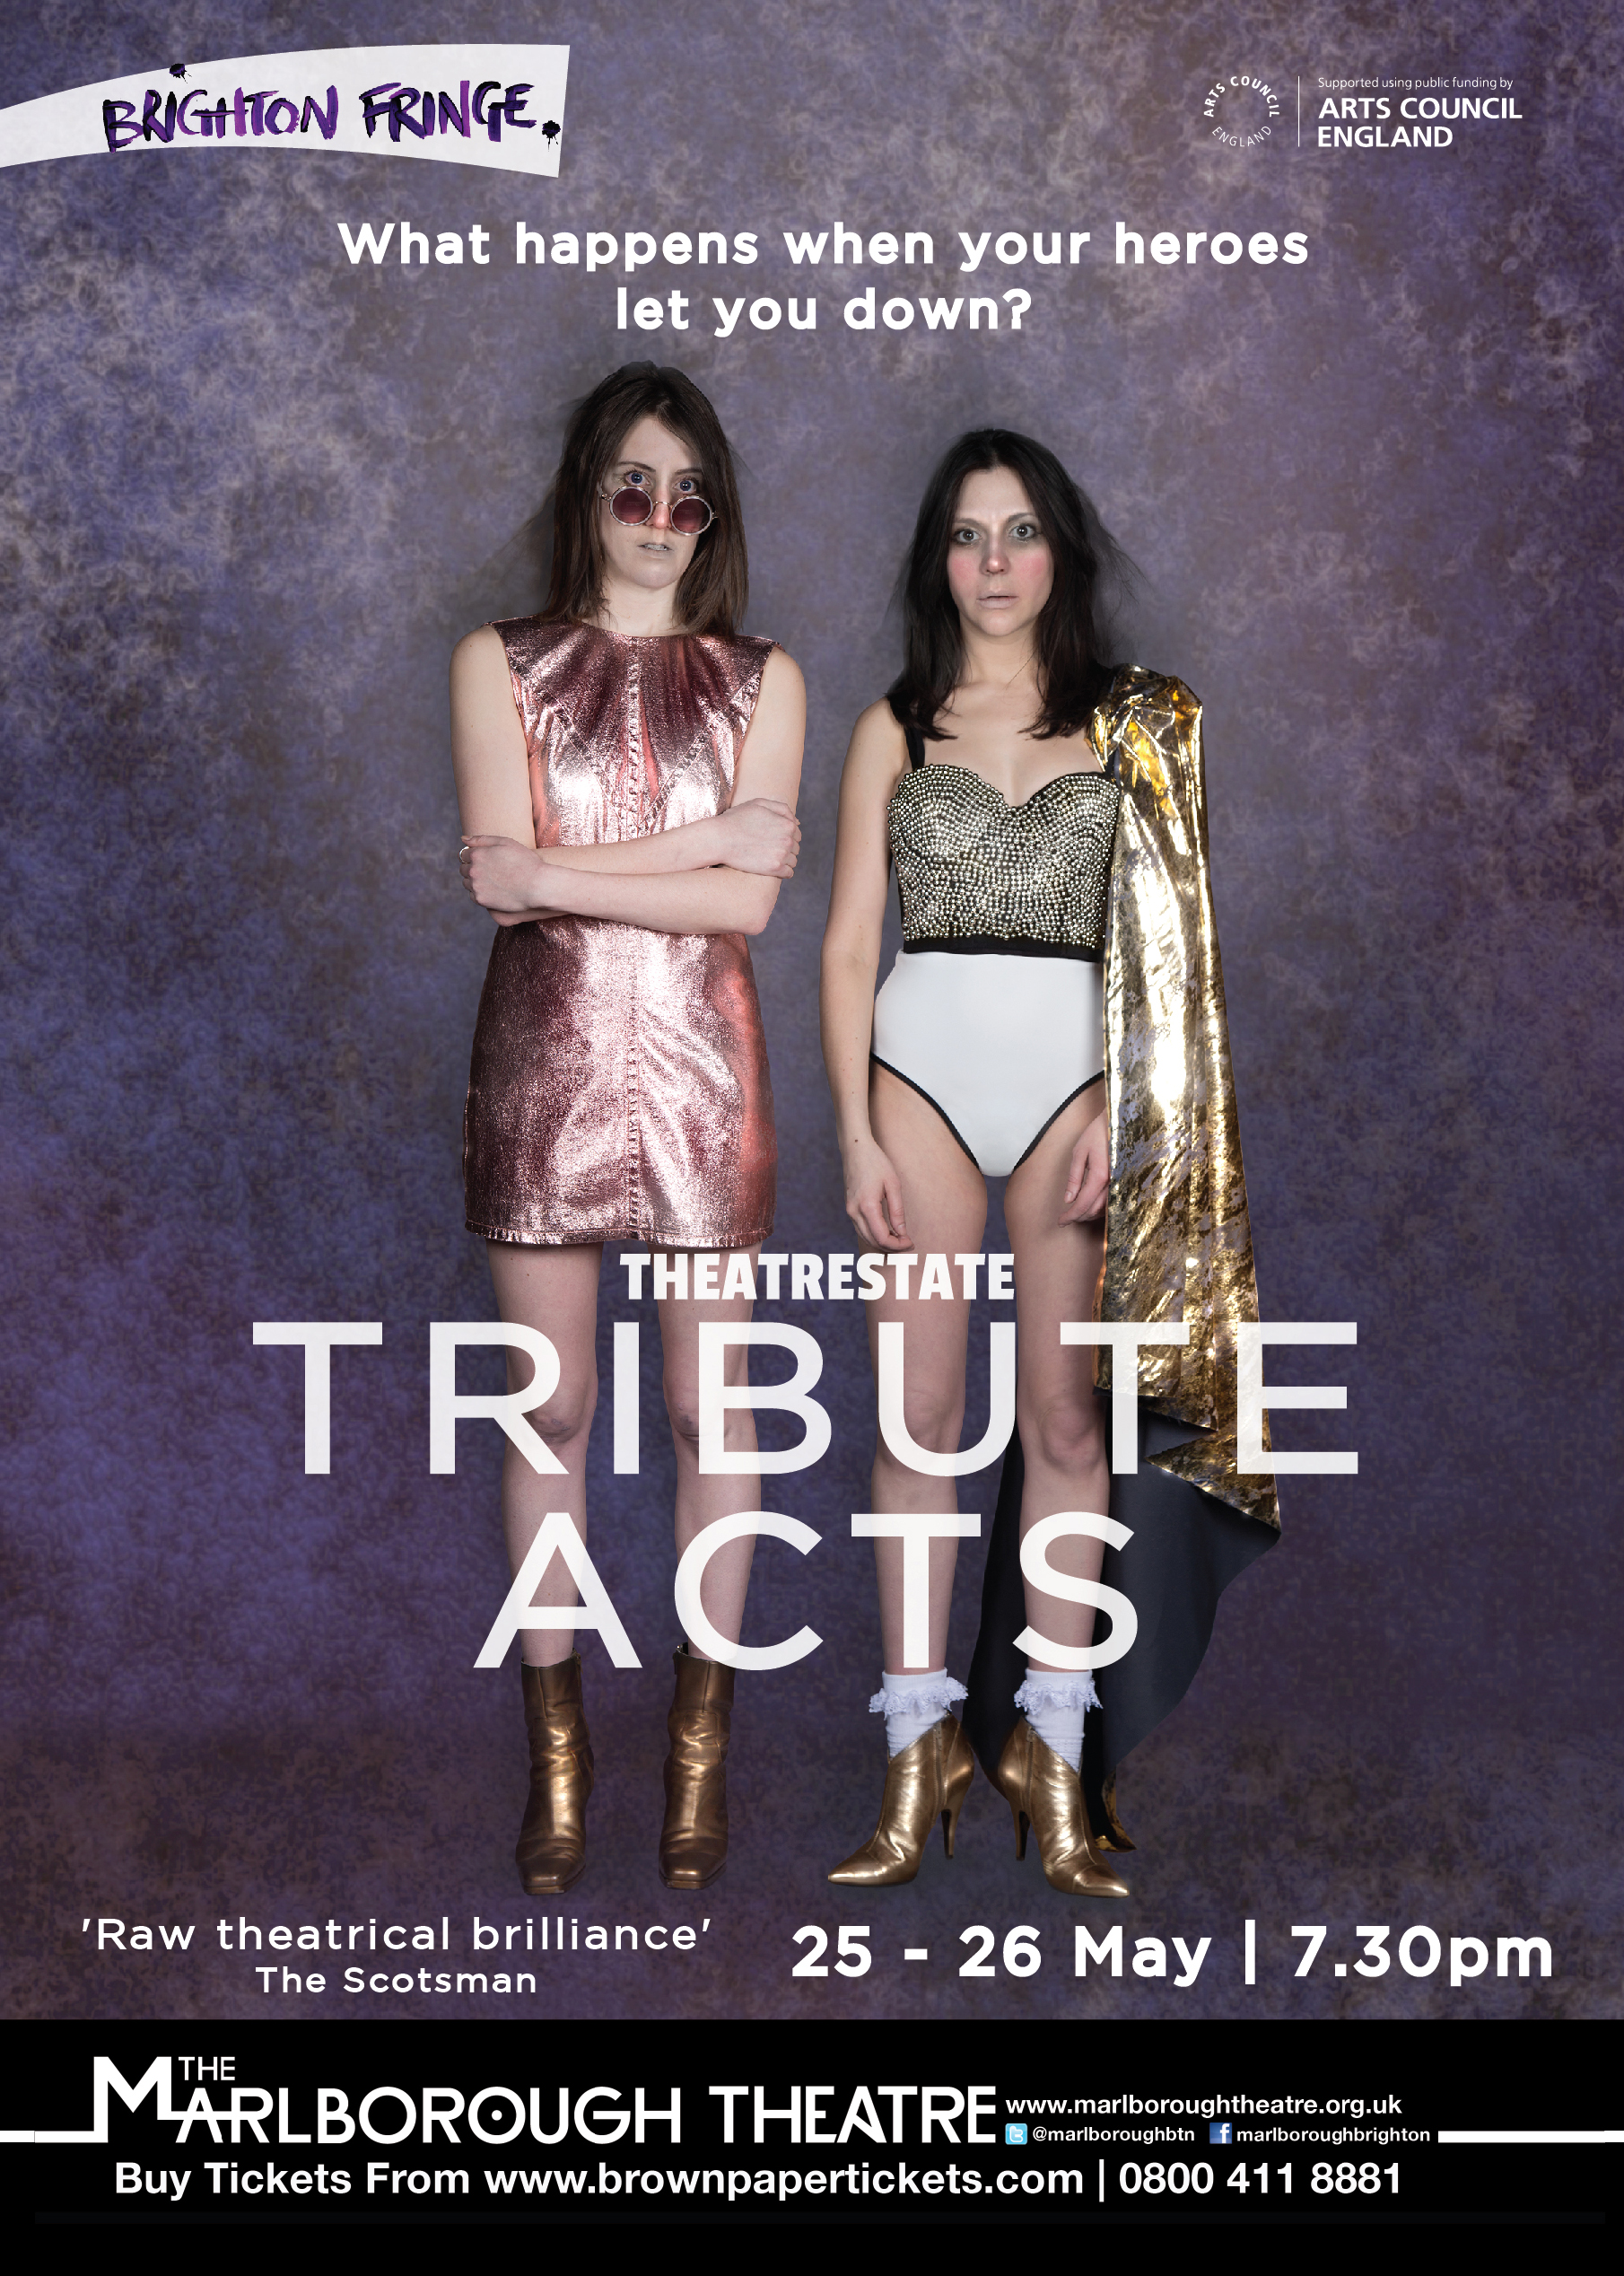 A3_TributeActs_Brighton2016-01.jpg